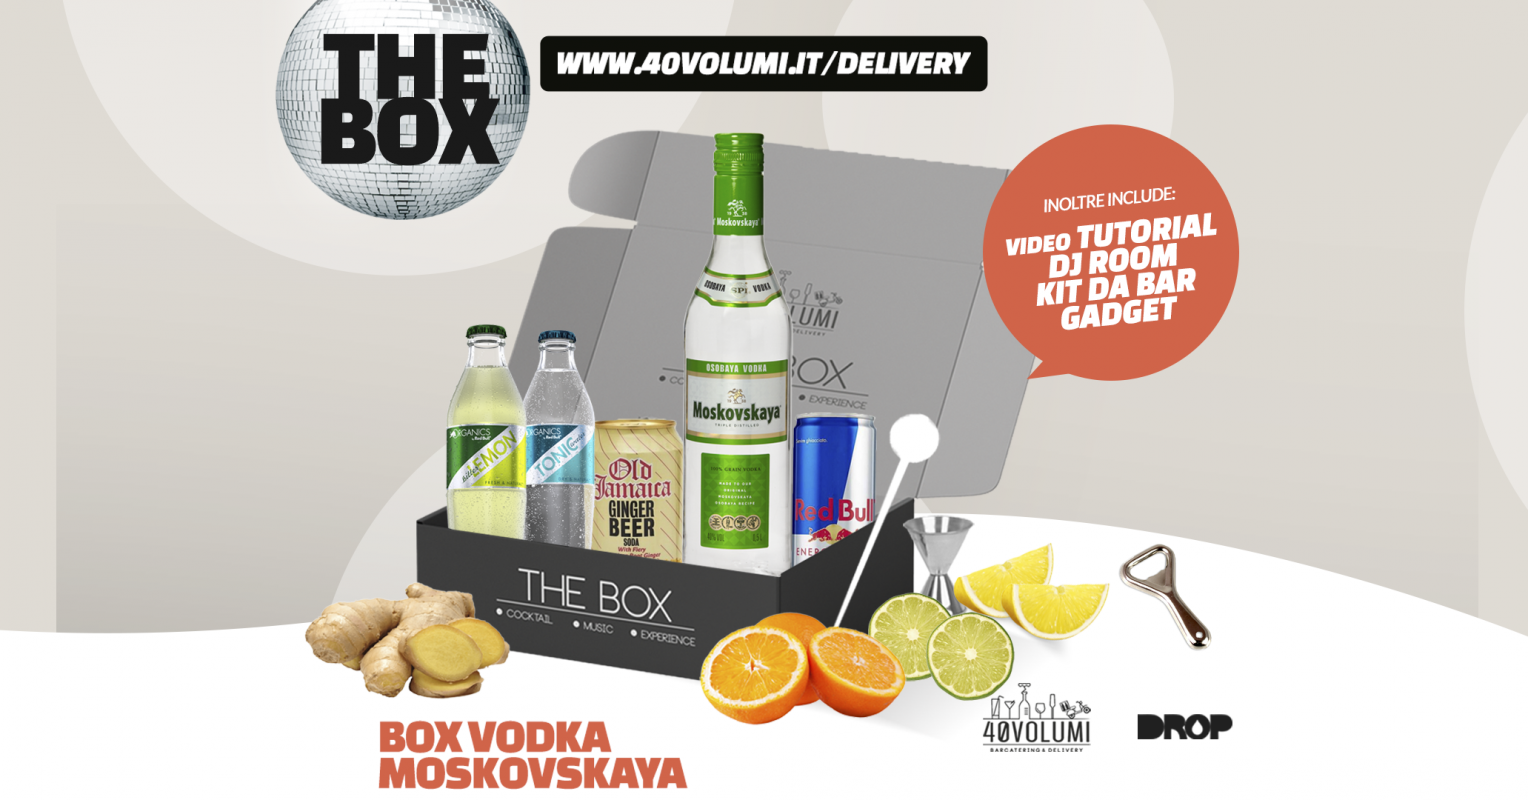 box vodka moskovskaya per 40 volumi